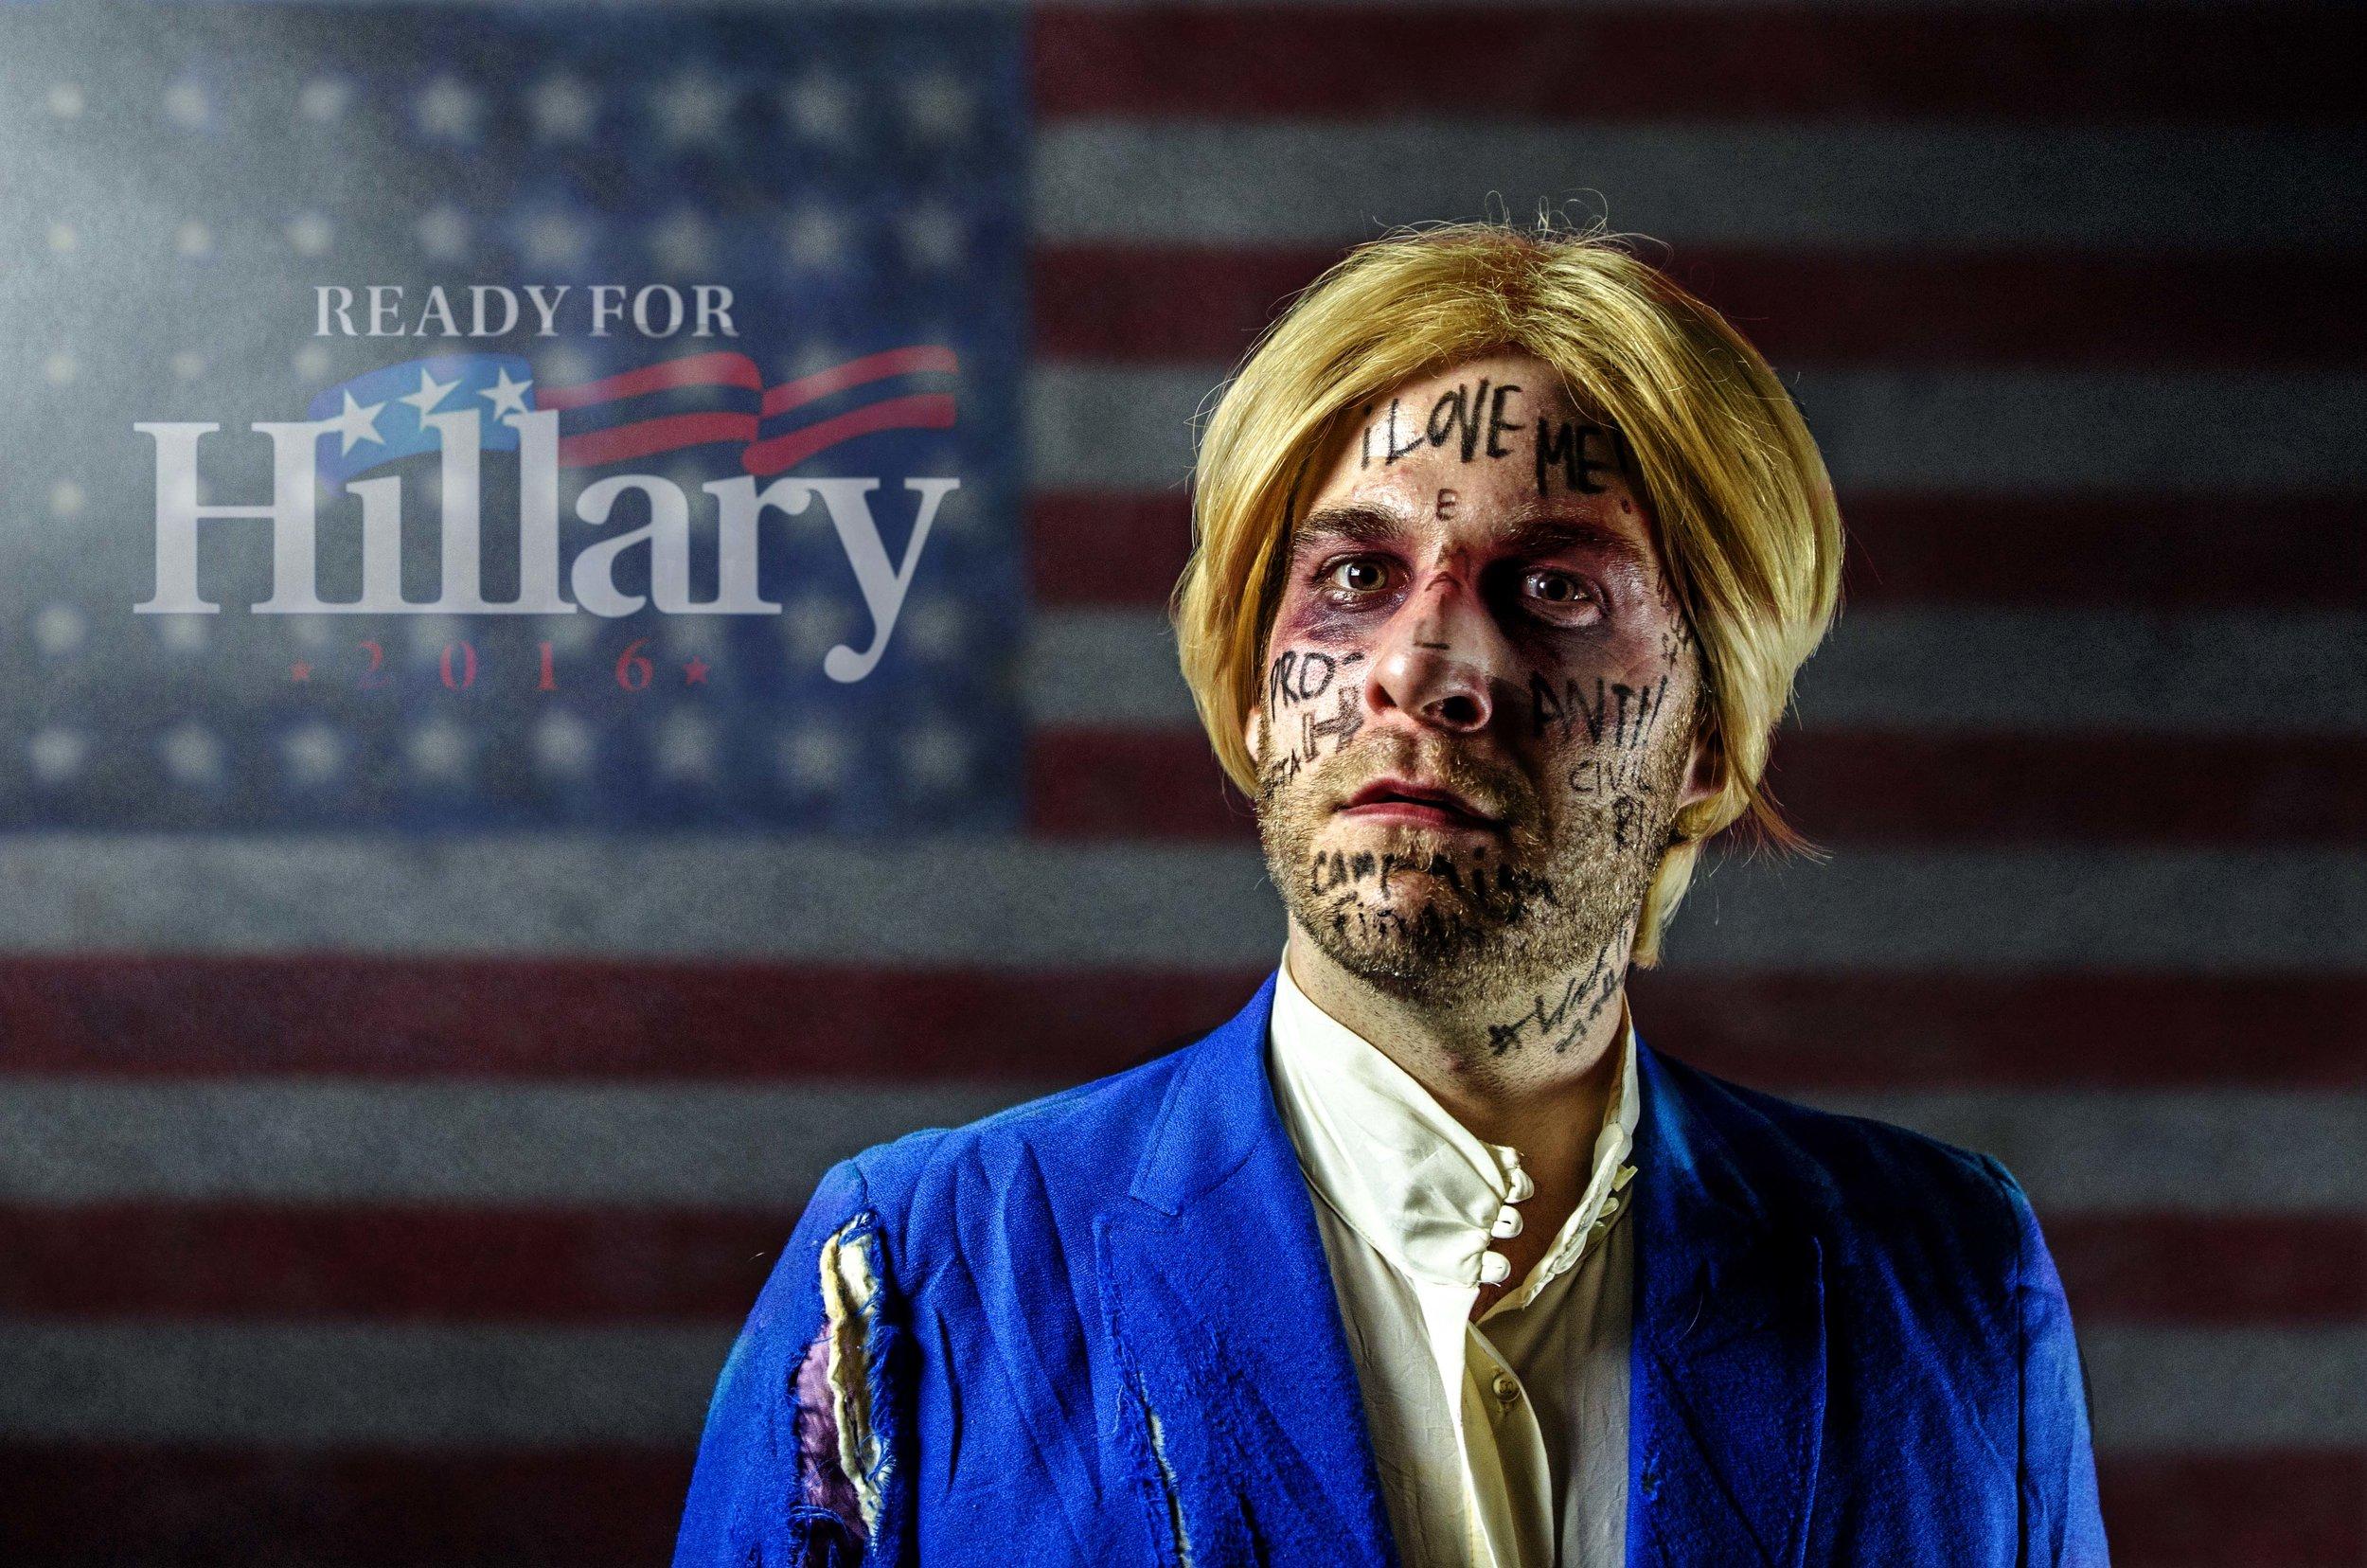 Hillary Clinton in The Hopefuls, Photo by Eric Tsurumoto